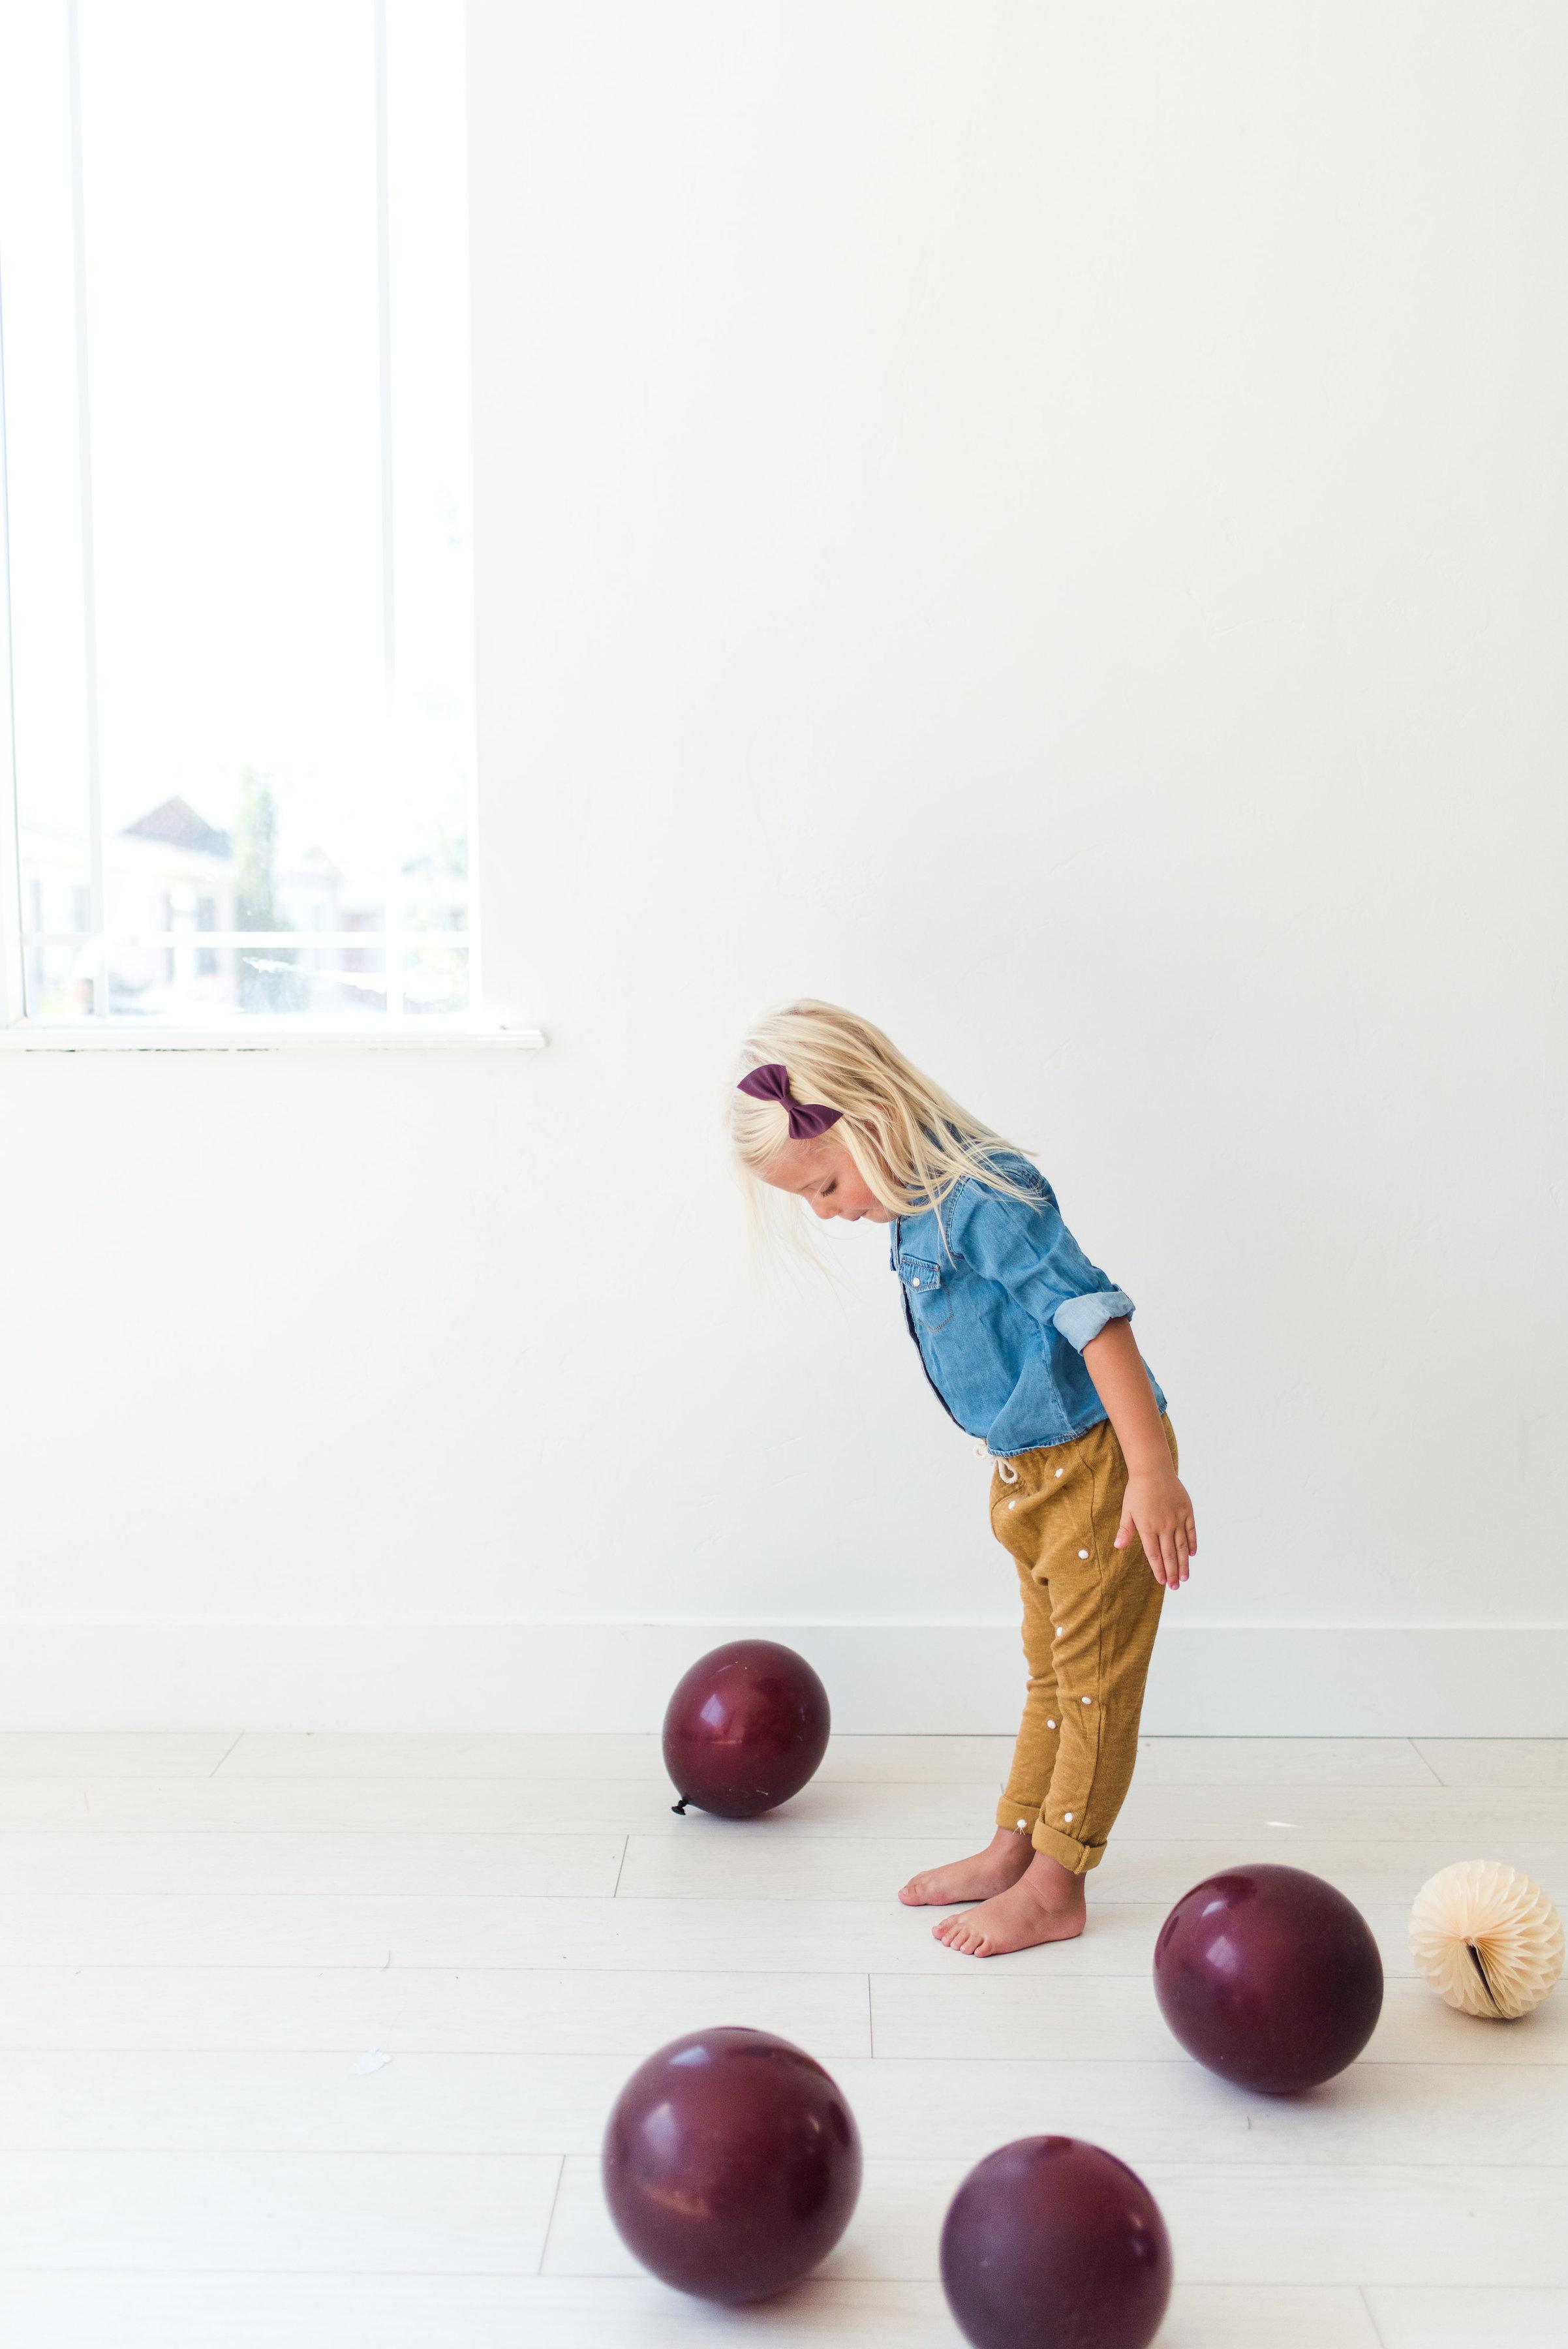 Textured polka dot trousers: https://www.zara.com/us/en/kids/baby-girl-%7C-3-months---4-years/skirts-and-trousers/textured-polka-dot-trousers-c269281p4874635.html